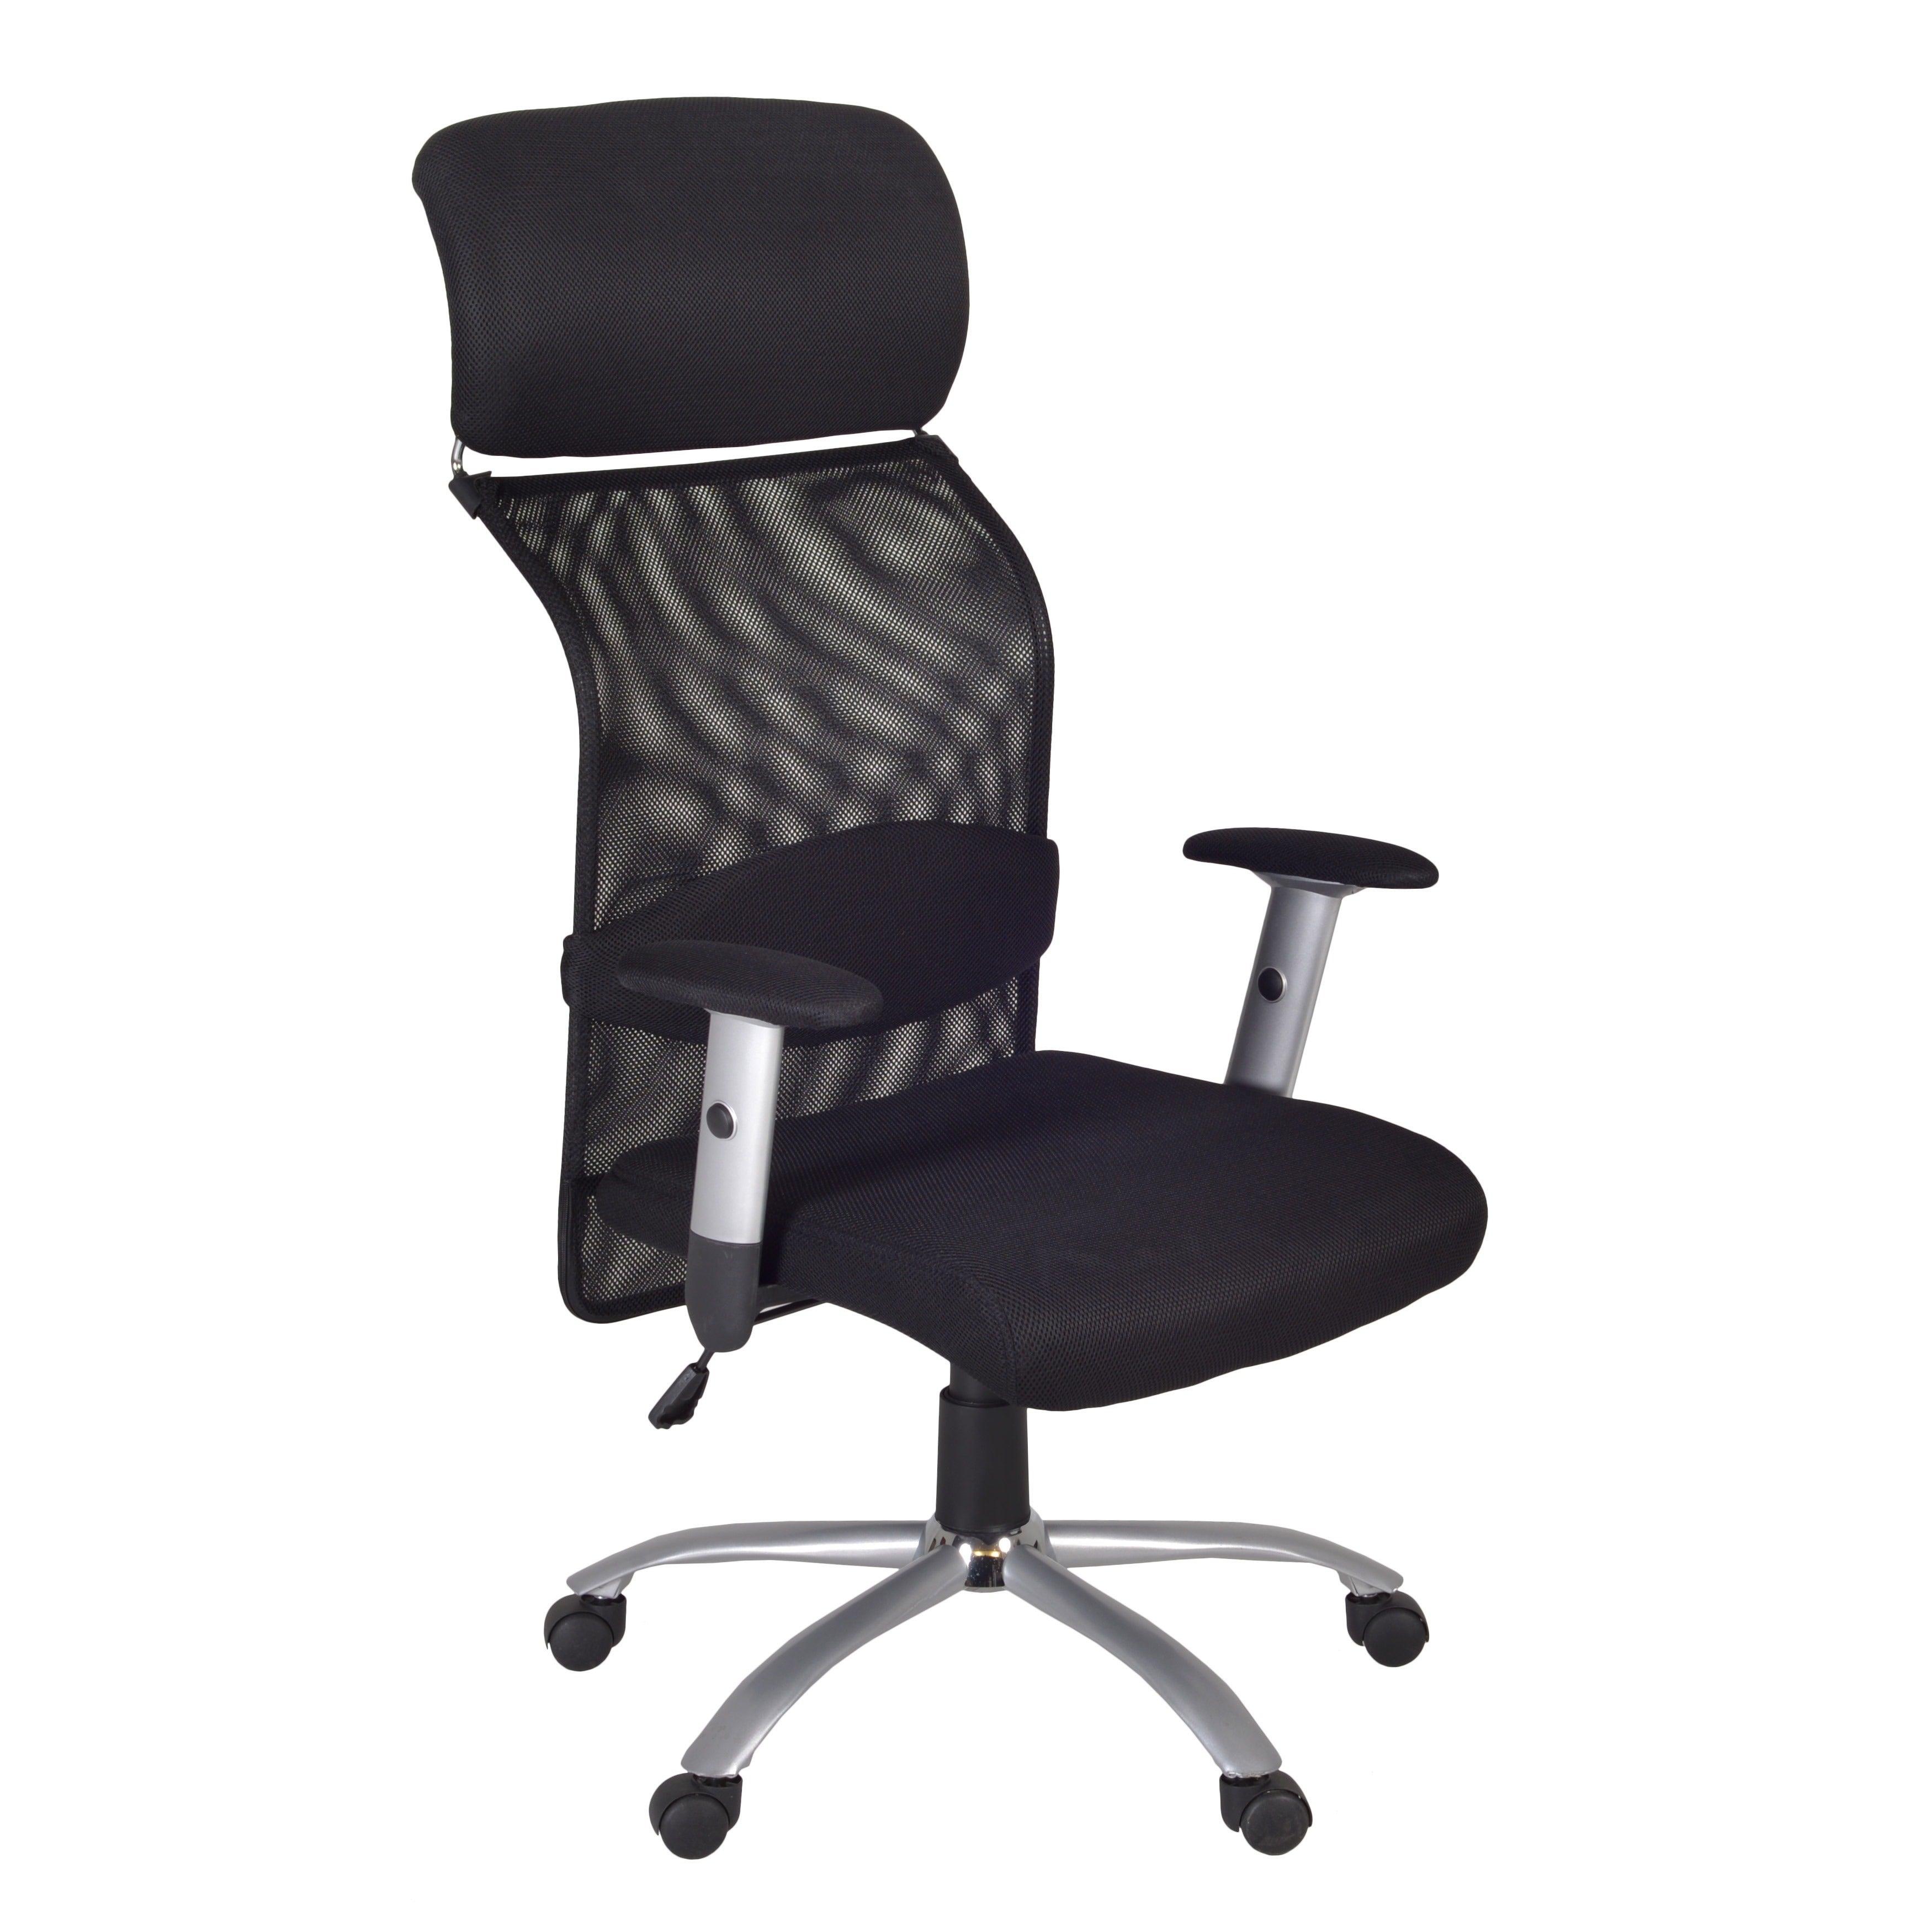 Apire Lumbar Support High Back Office Chair Overstock